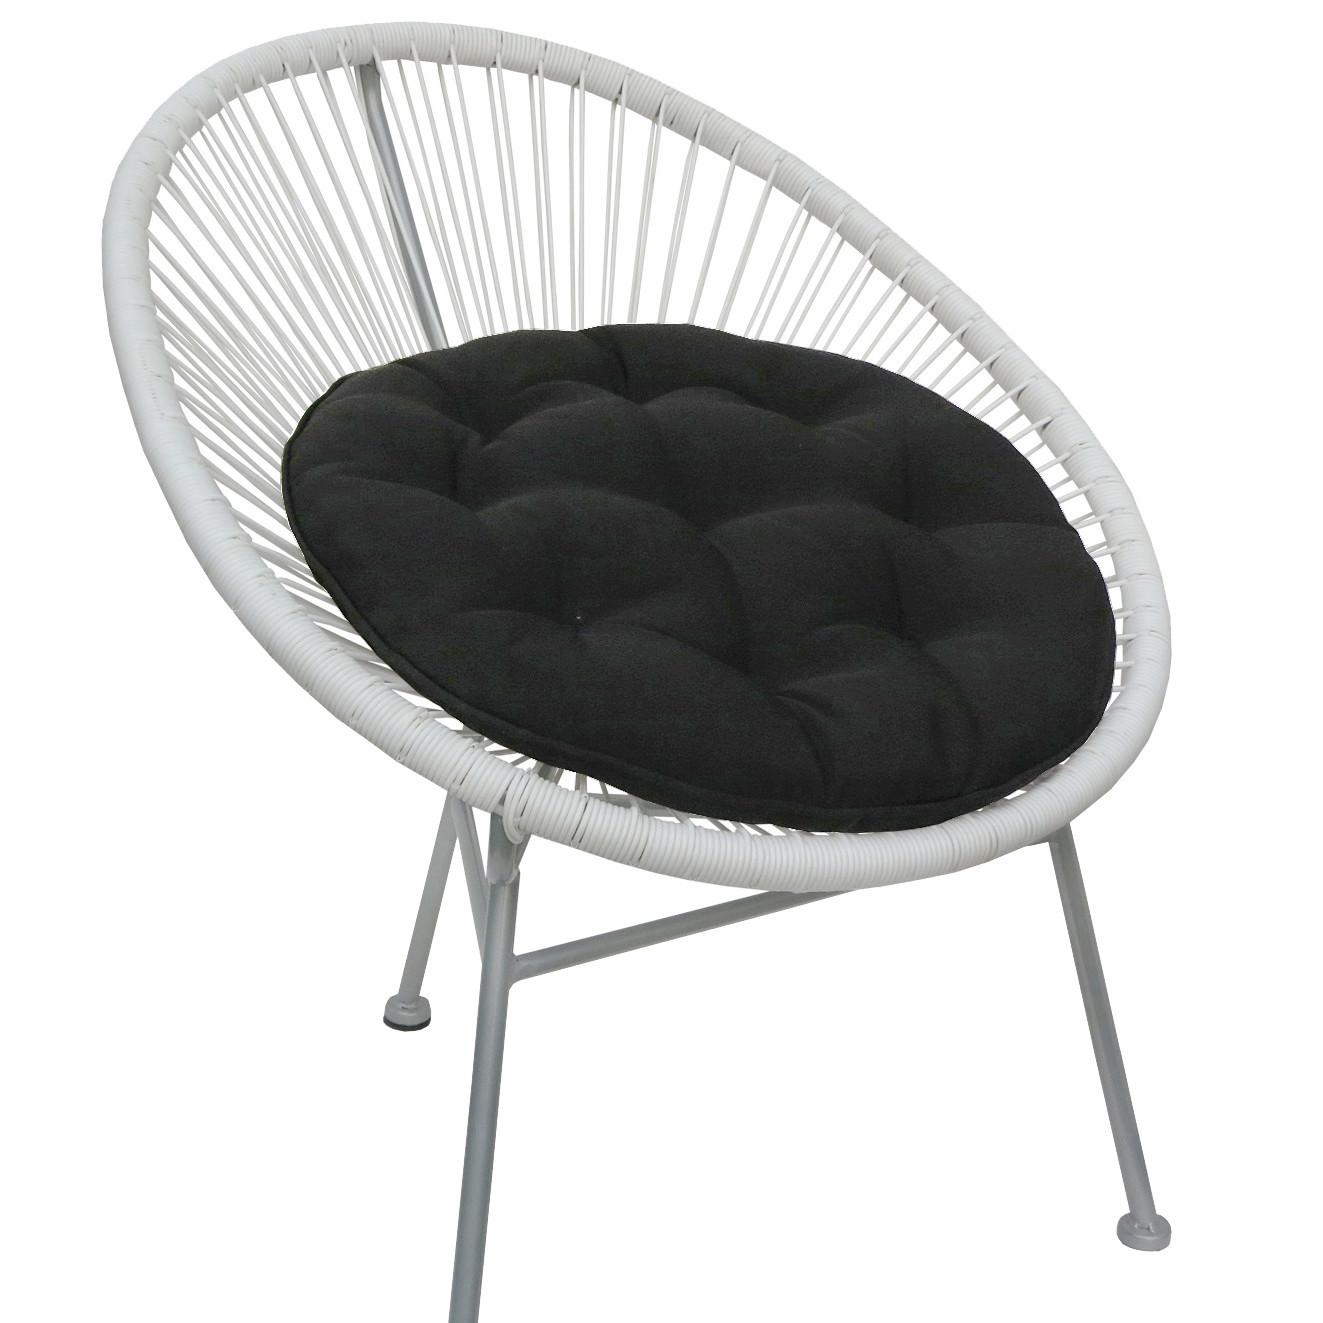 NEW-Amelia-Acapulco-Chair-Cushion